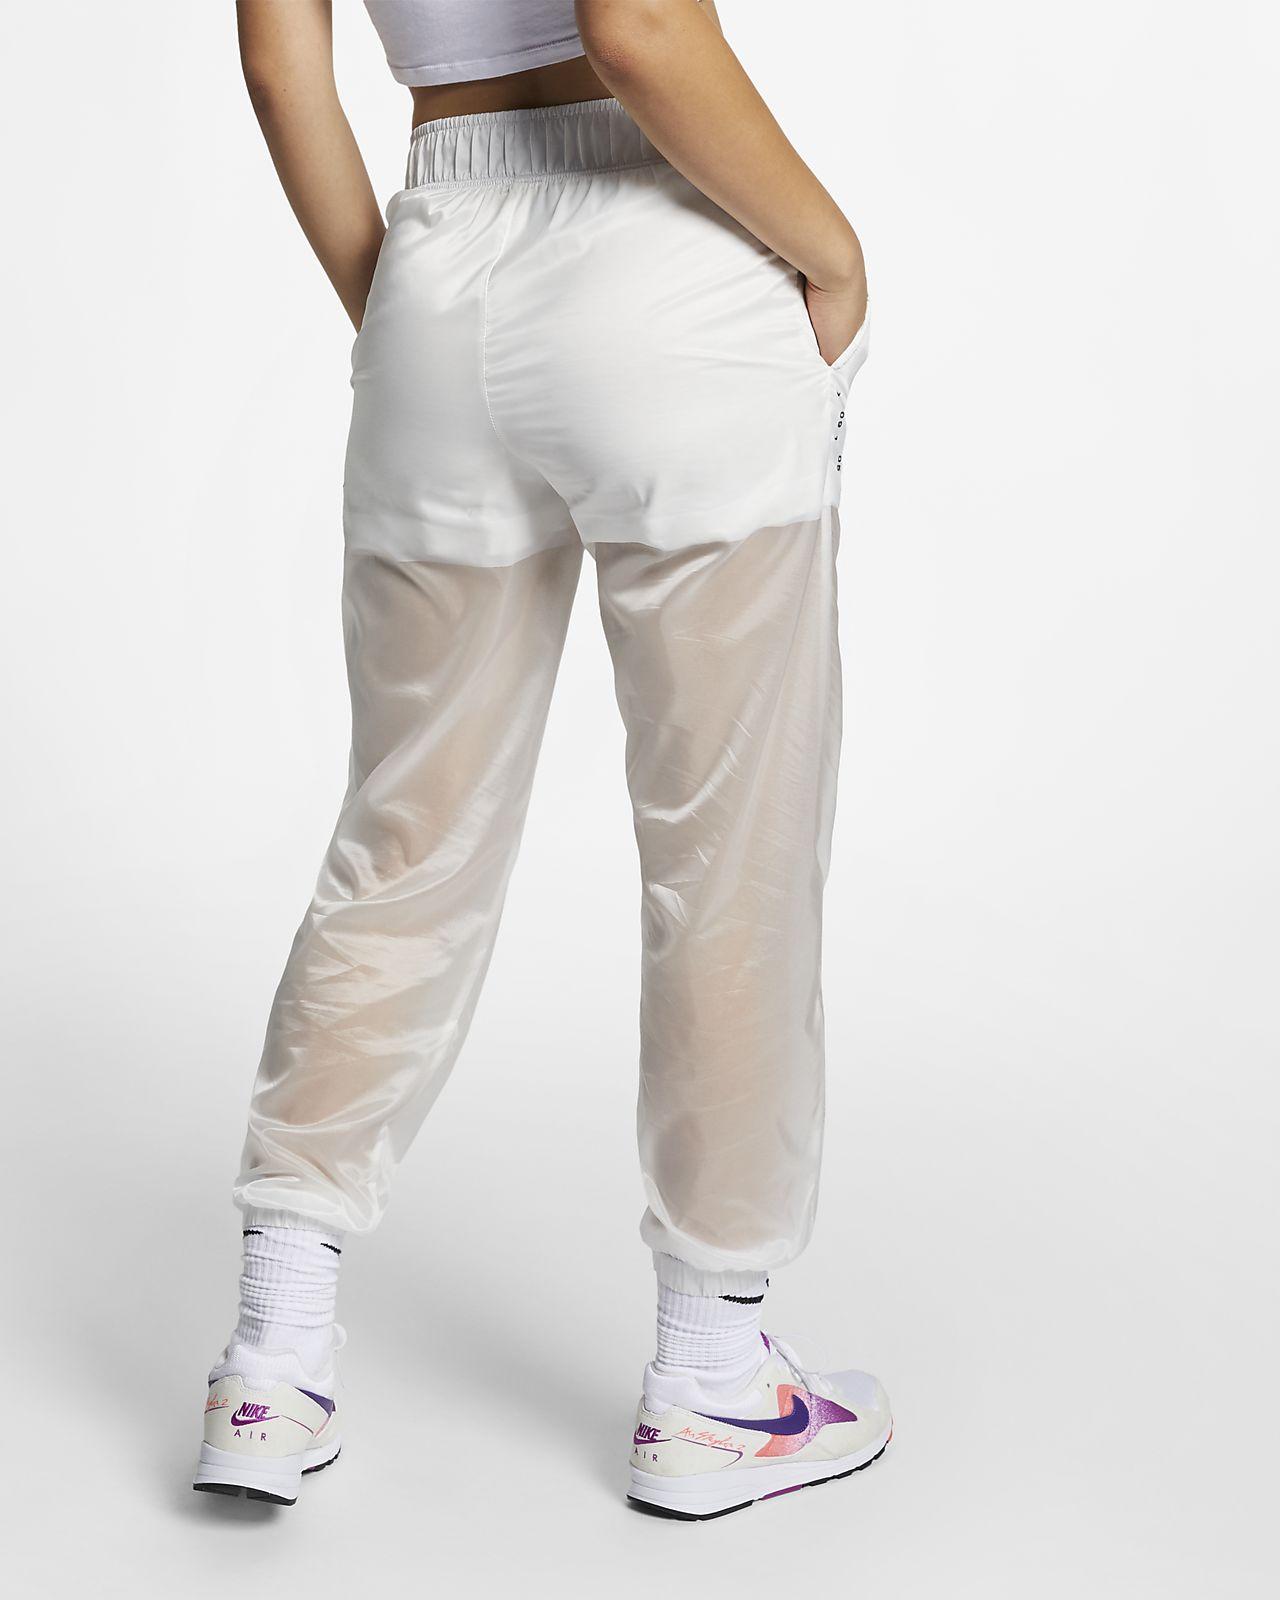 2efd957de1e Nike Sportswear Tech Pack Pantalón de tejido Woven - Mujer. Nike.com ES